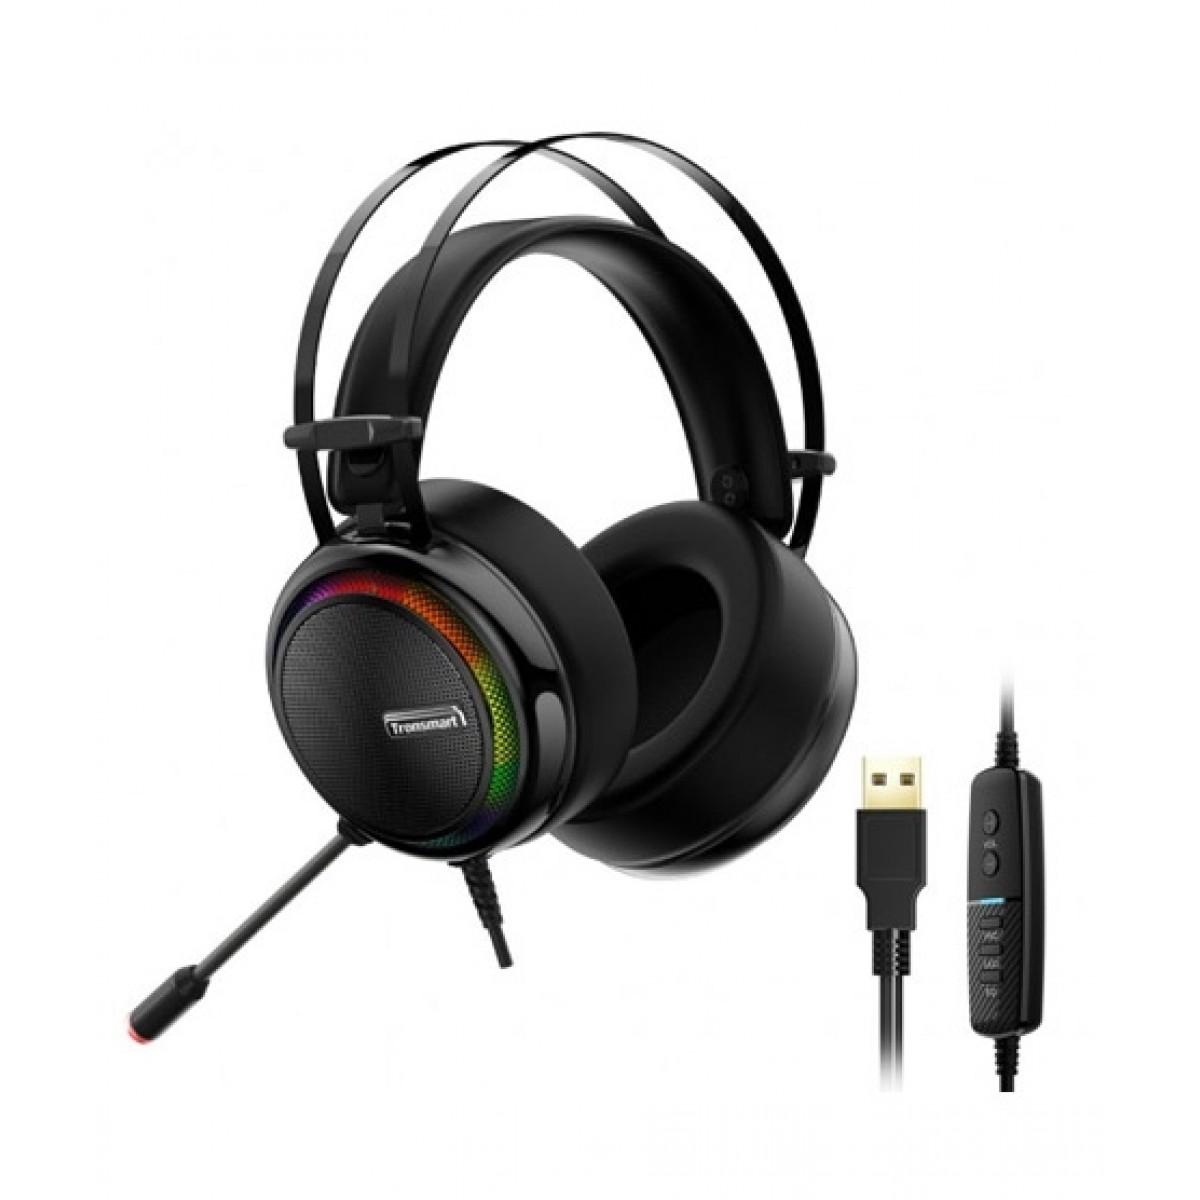 Tronsmart Glary 7.1 Virtual Sound Gaming Headset